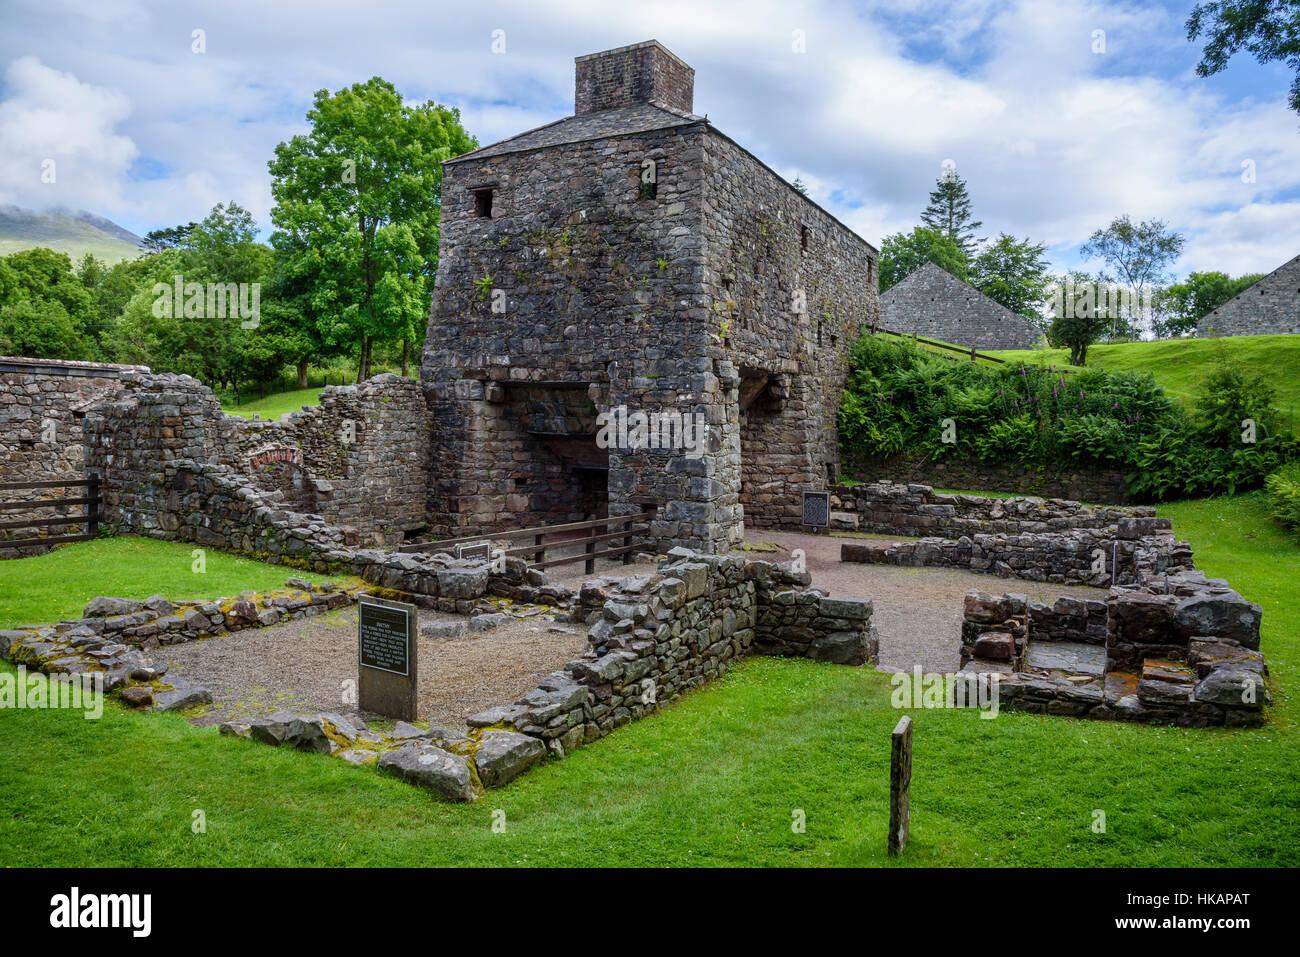 Bunaw remains of ancient iron ore blast furnace, Argyll & Bute, Scotland - Stock Image